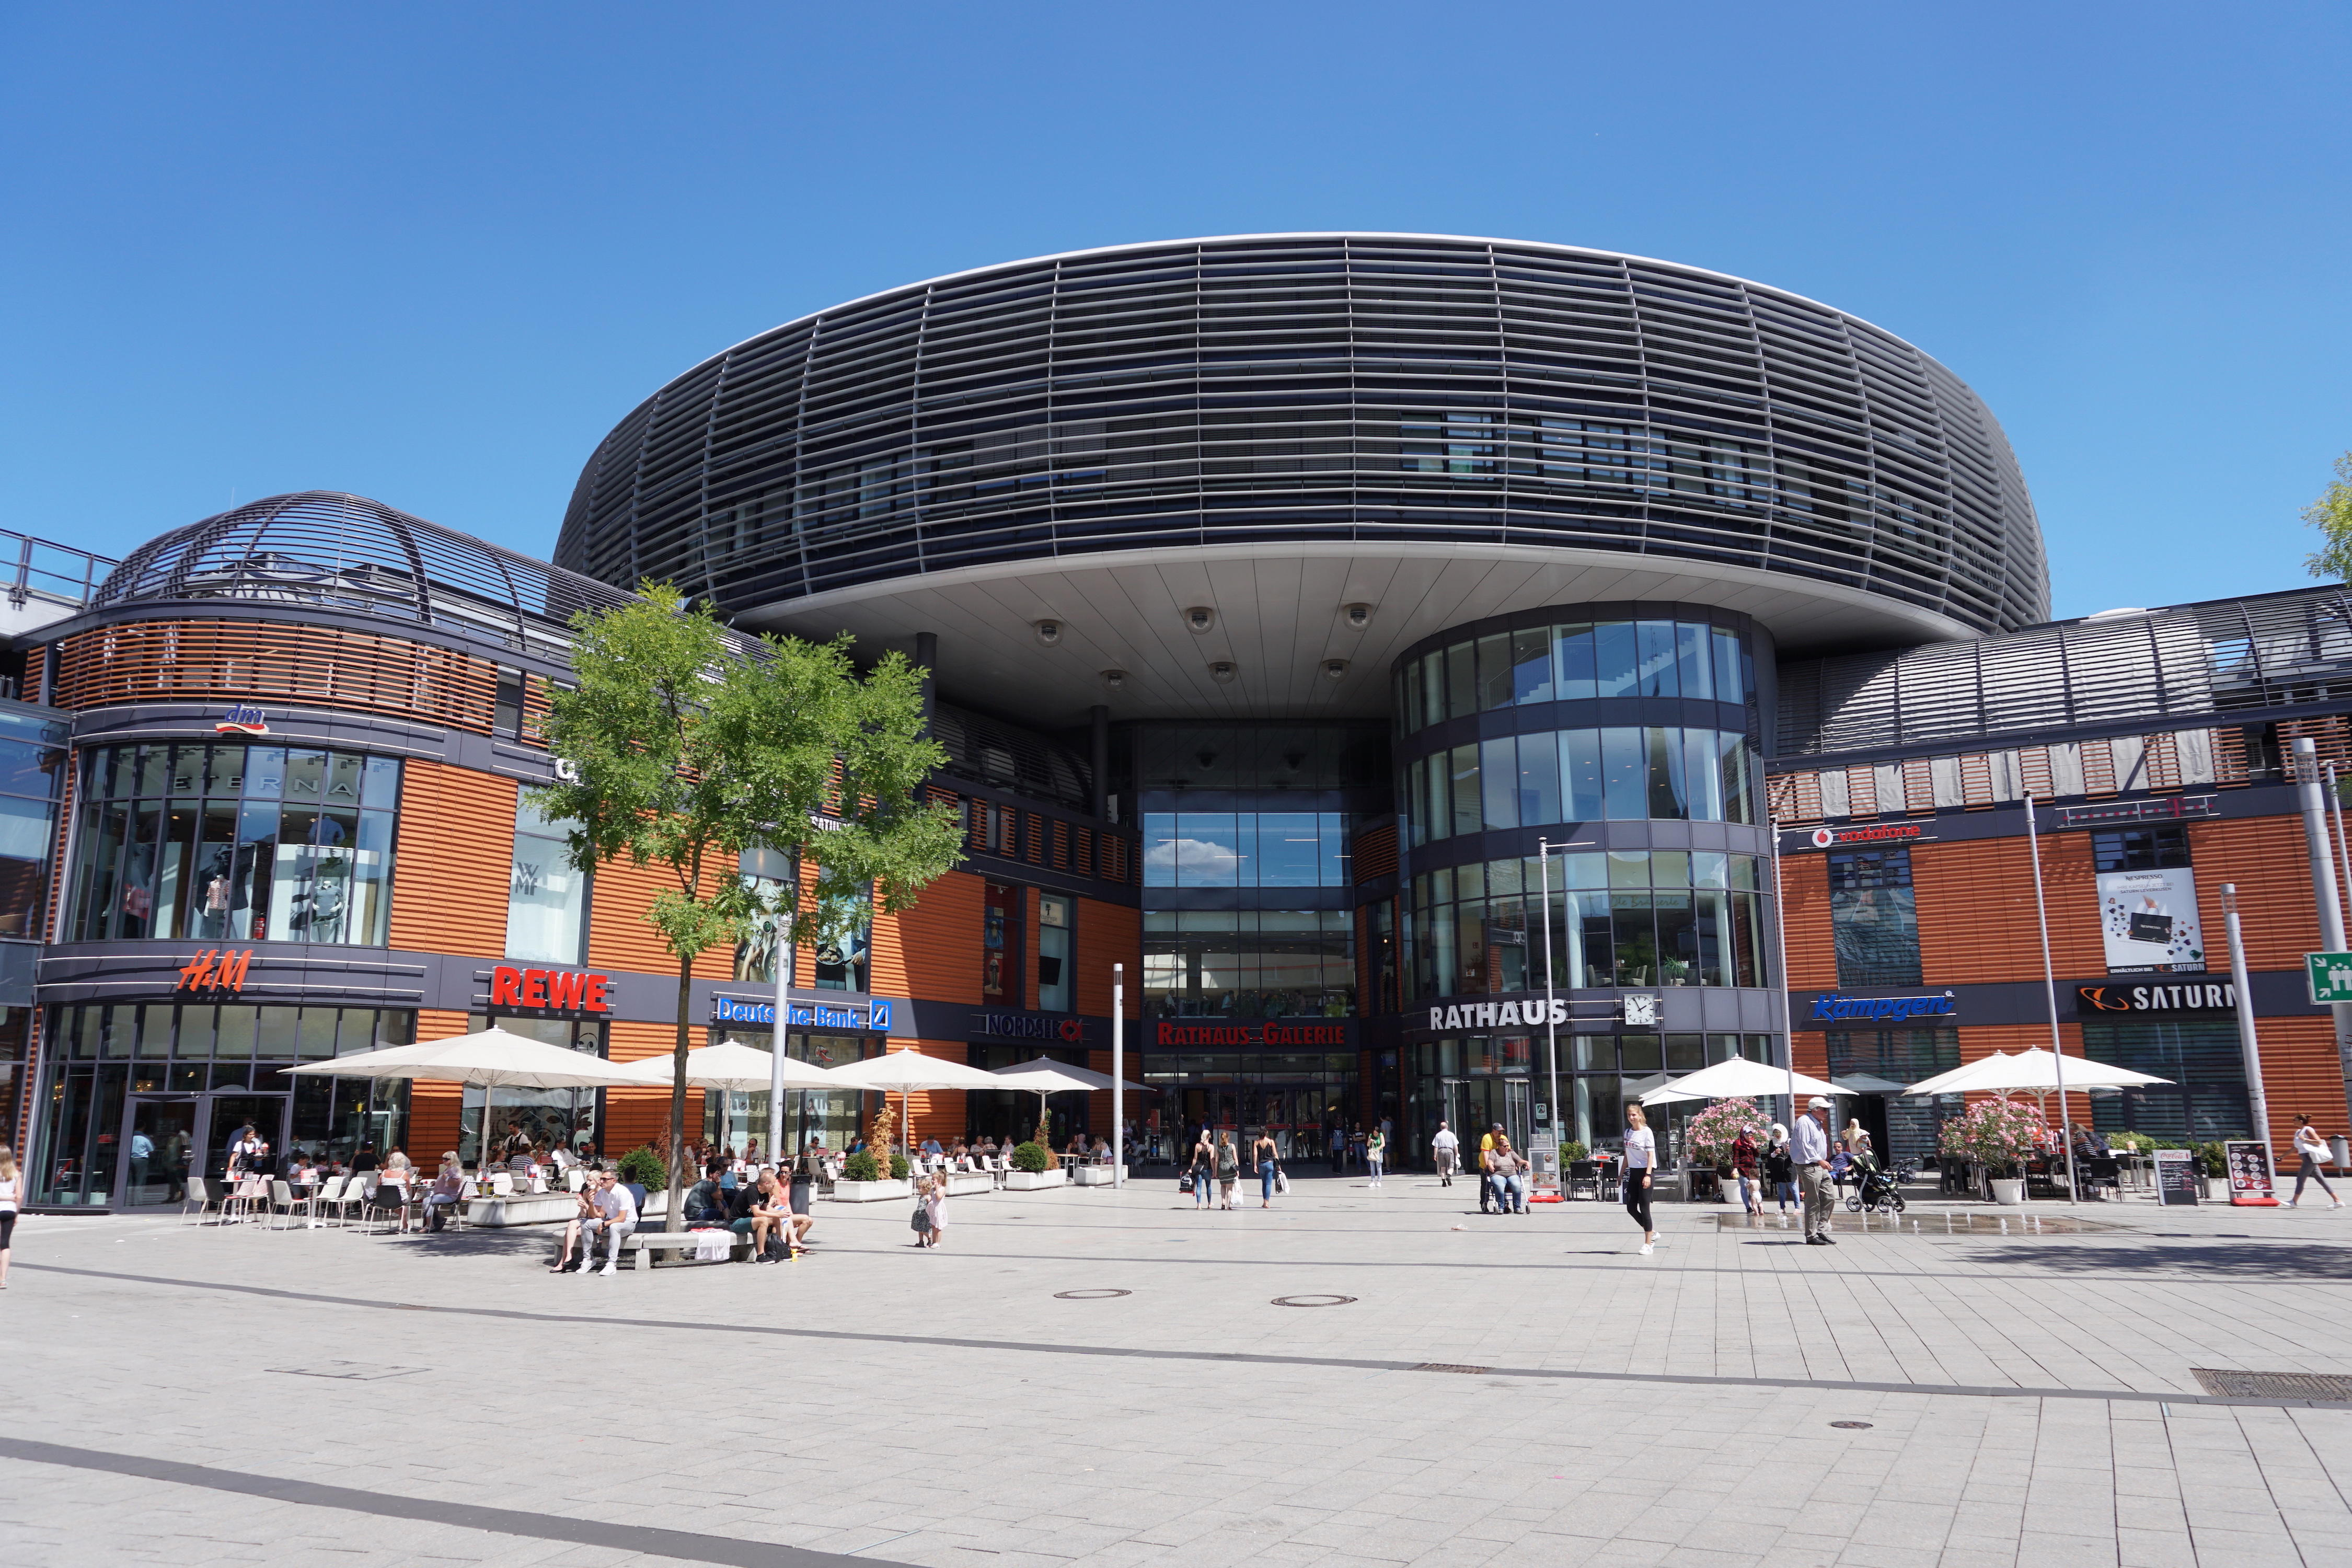 SATURN, Friedrich-Ebert-Platz 2 in Leverkusen